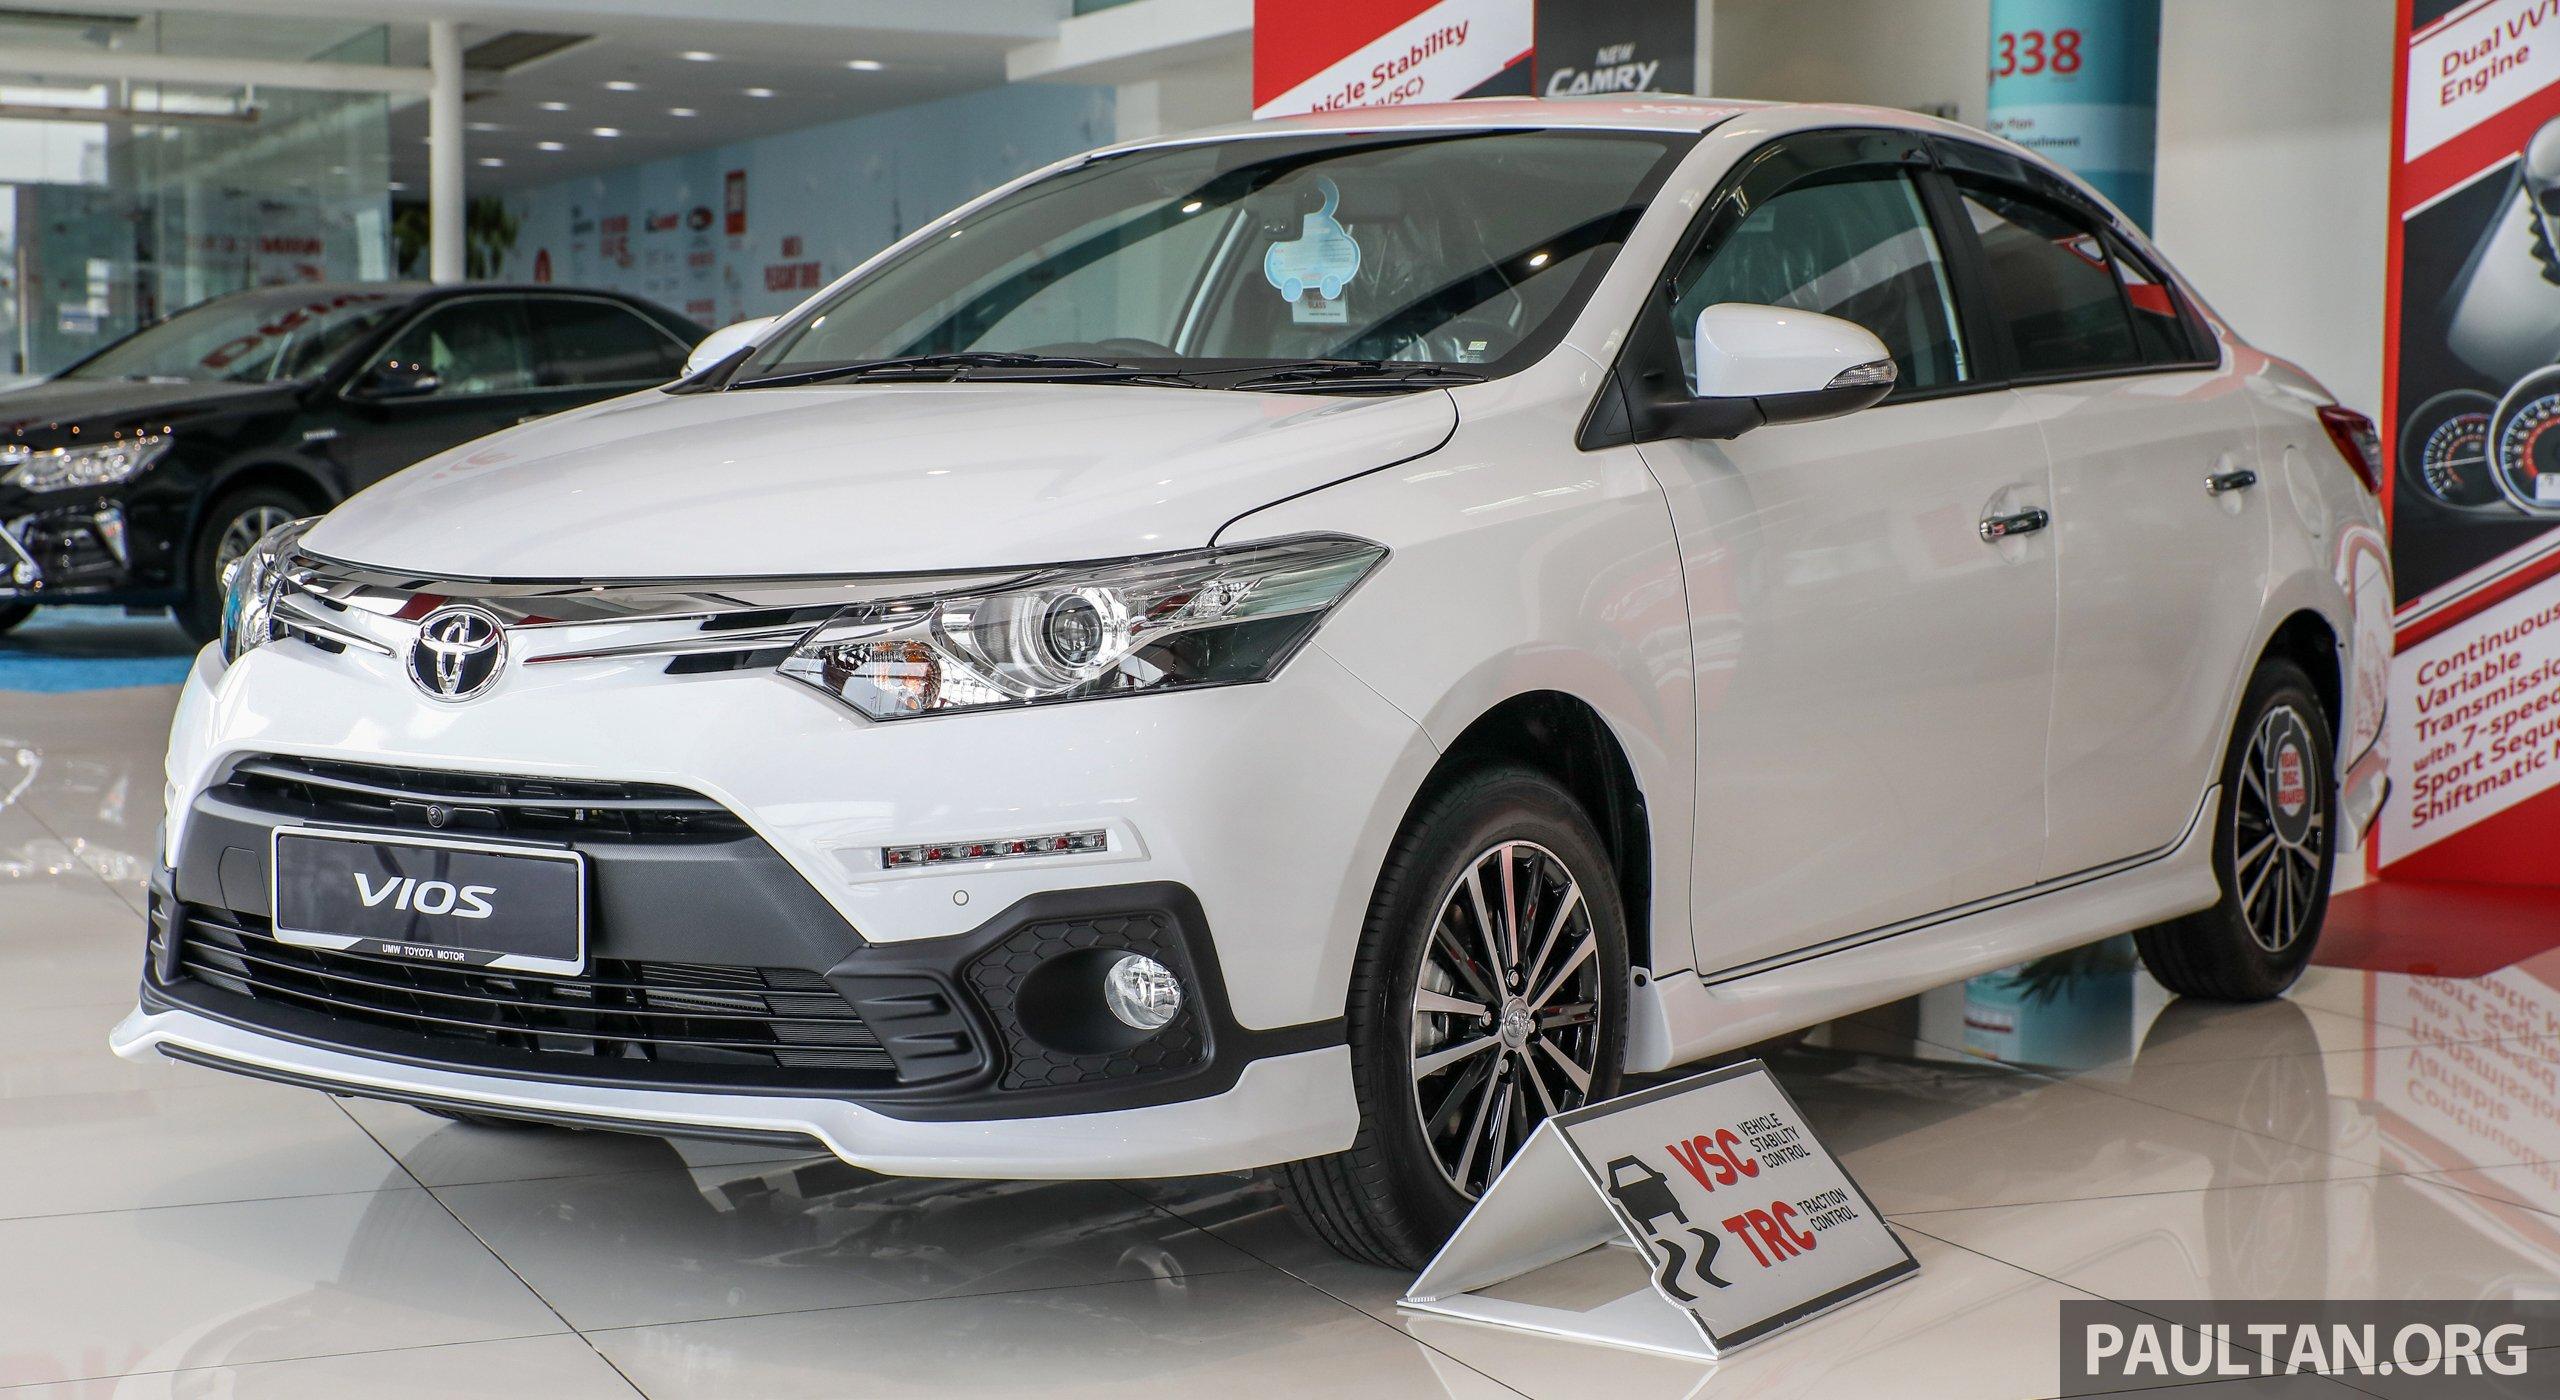 Kekurangan Harga Toyota Vios 2018 Perbandingan Harga